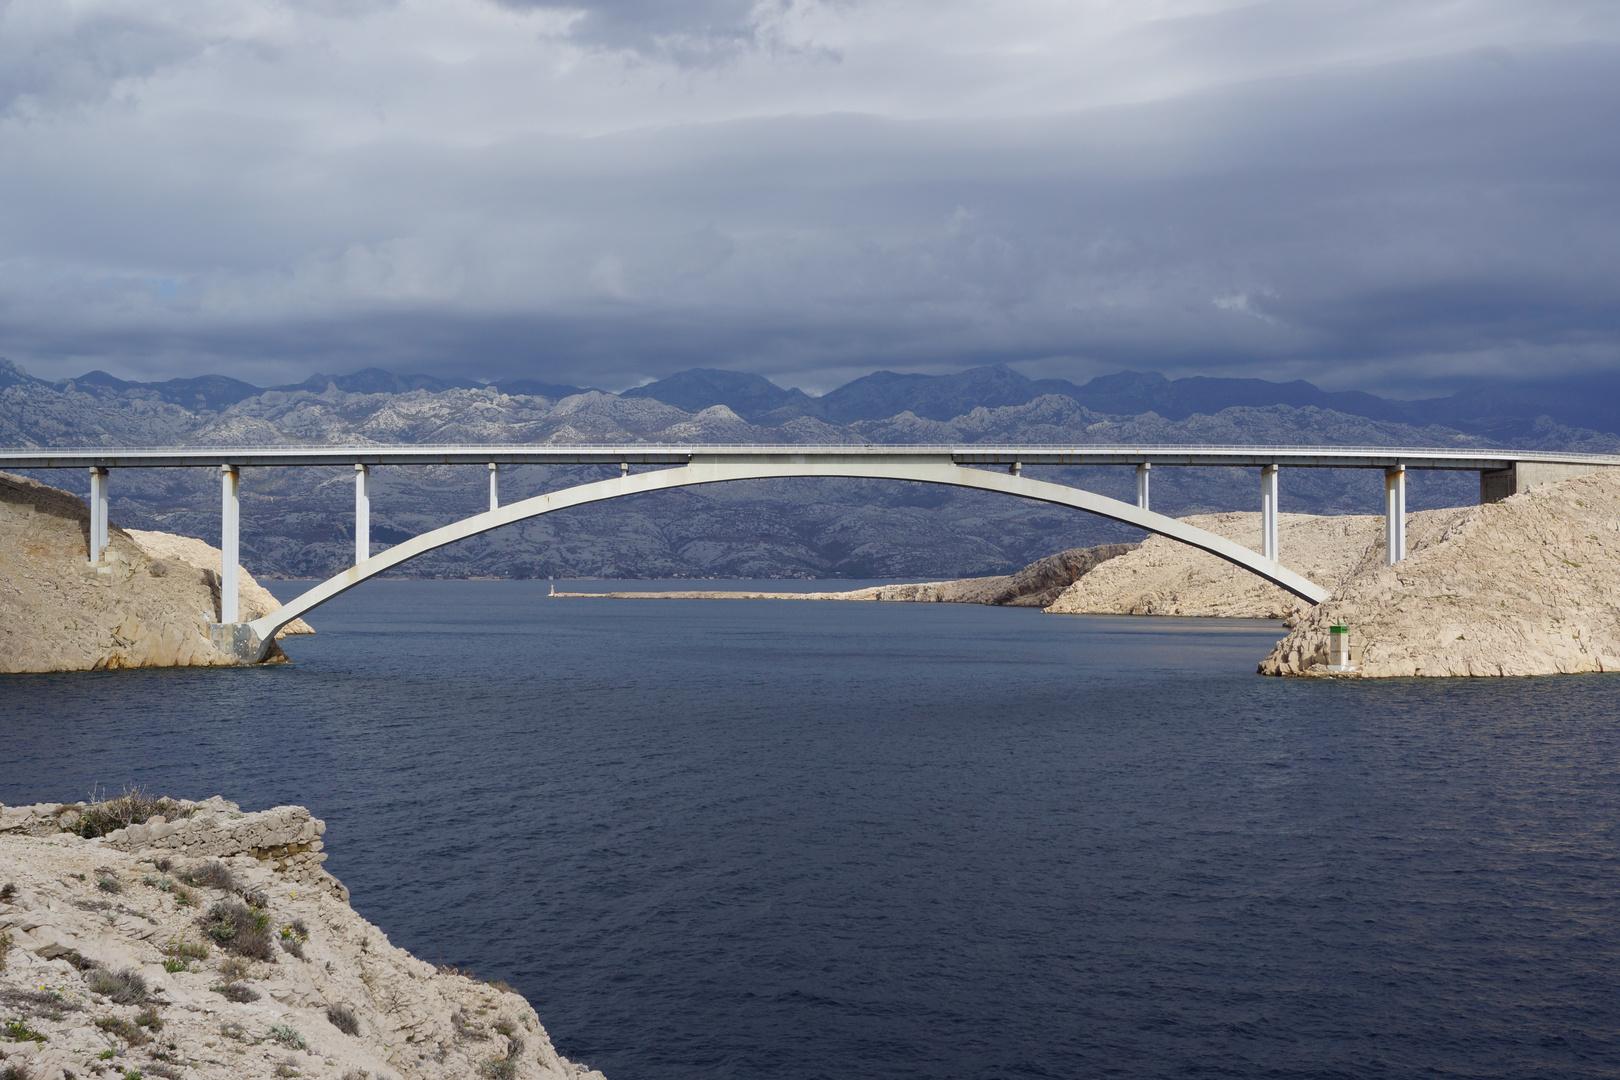 Brücke zur Insel Pag bei Abenddämmerung